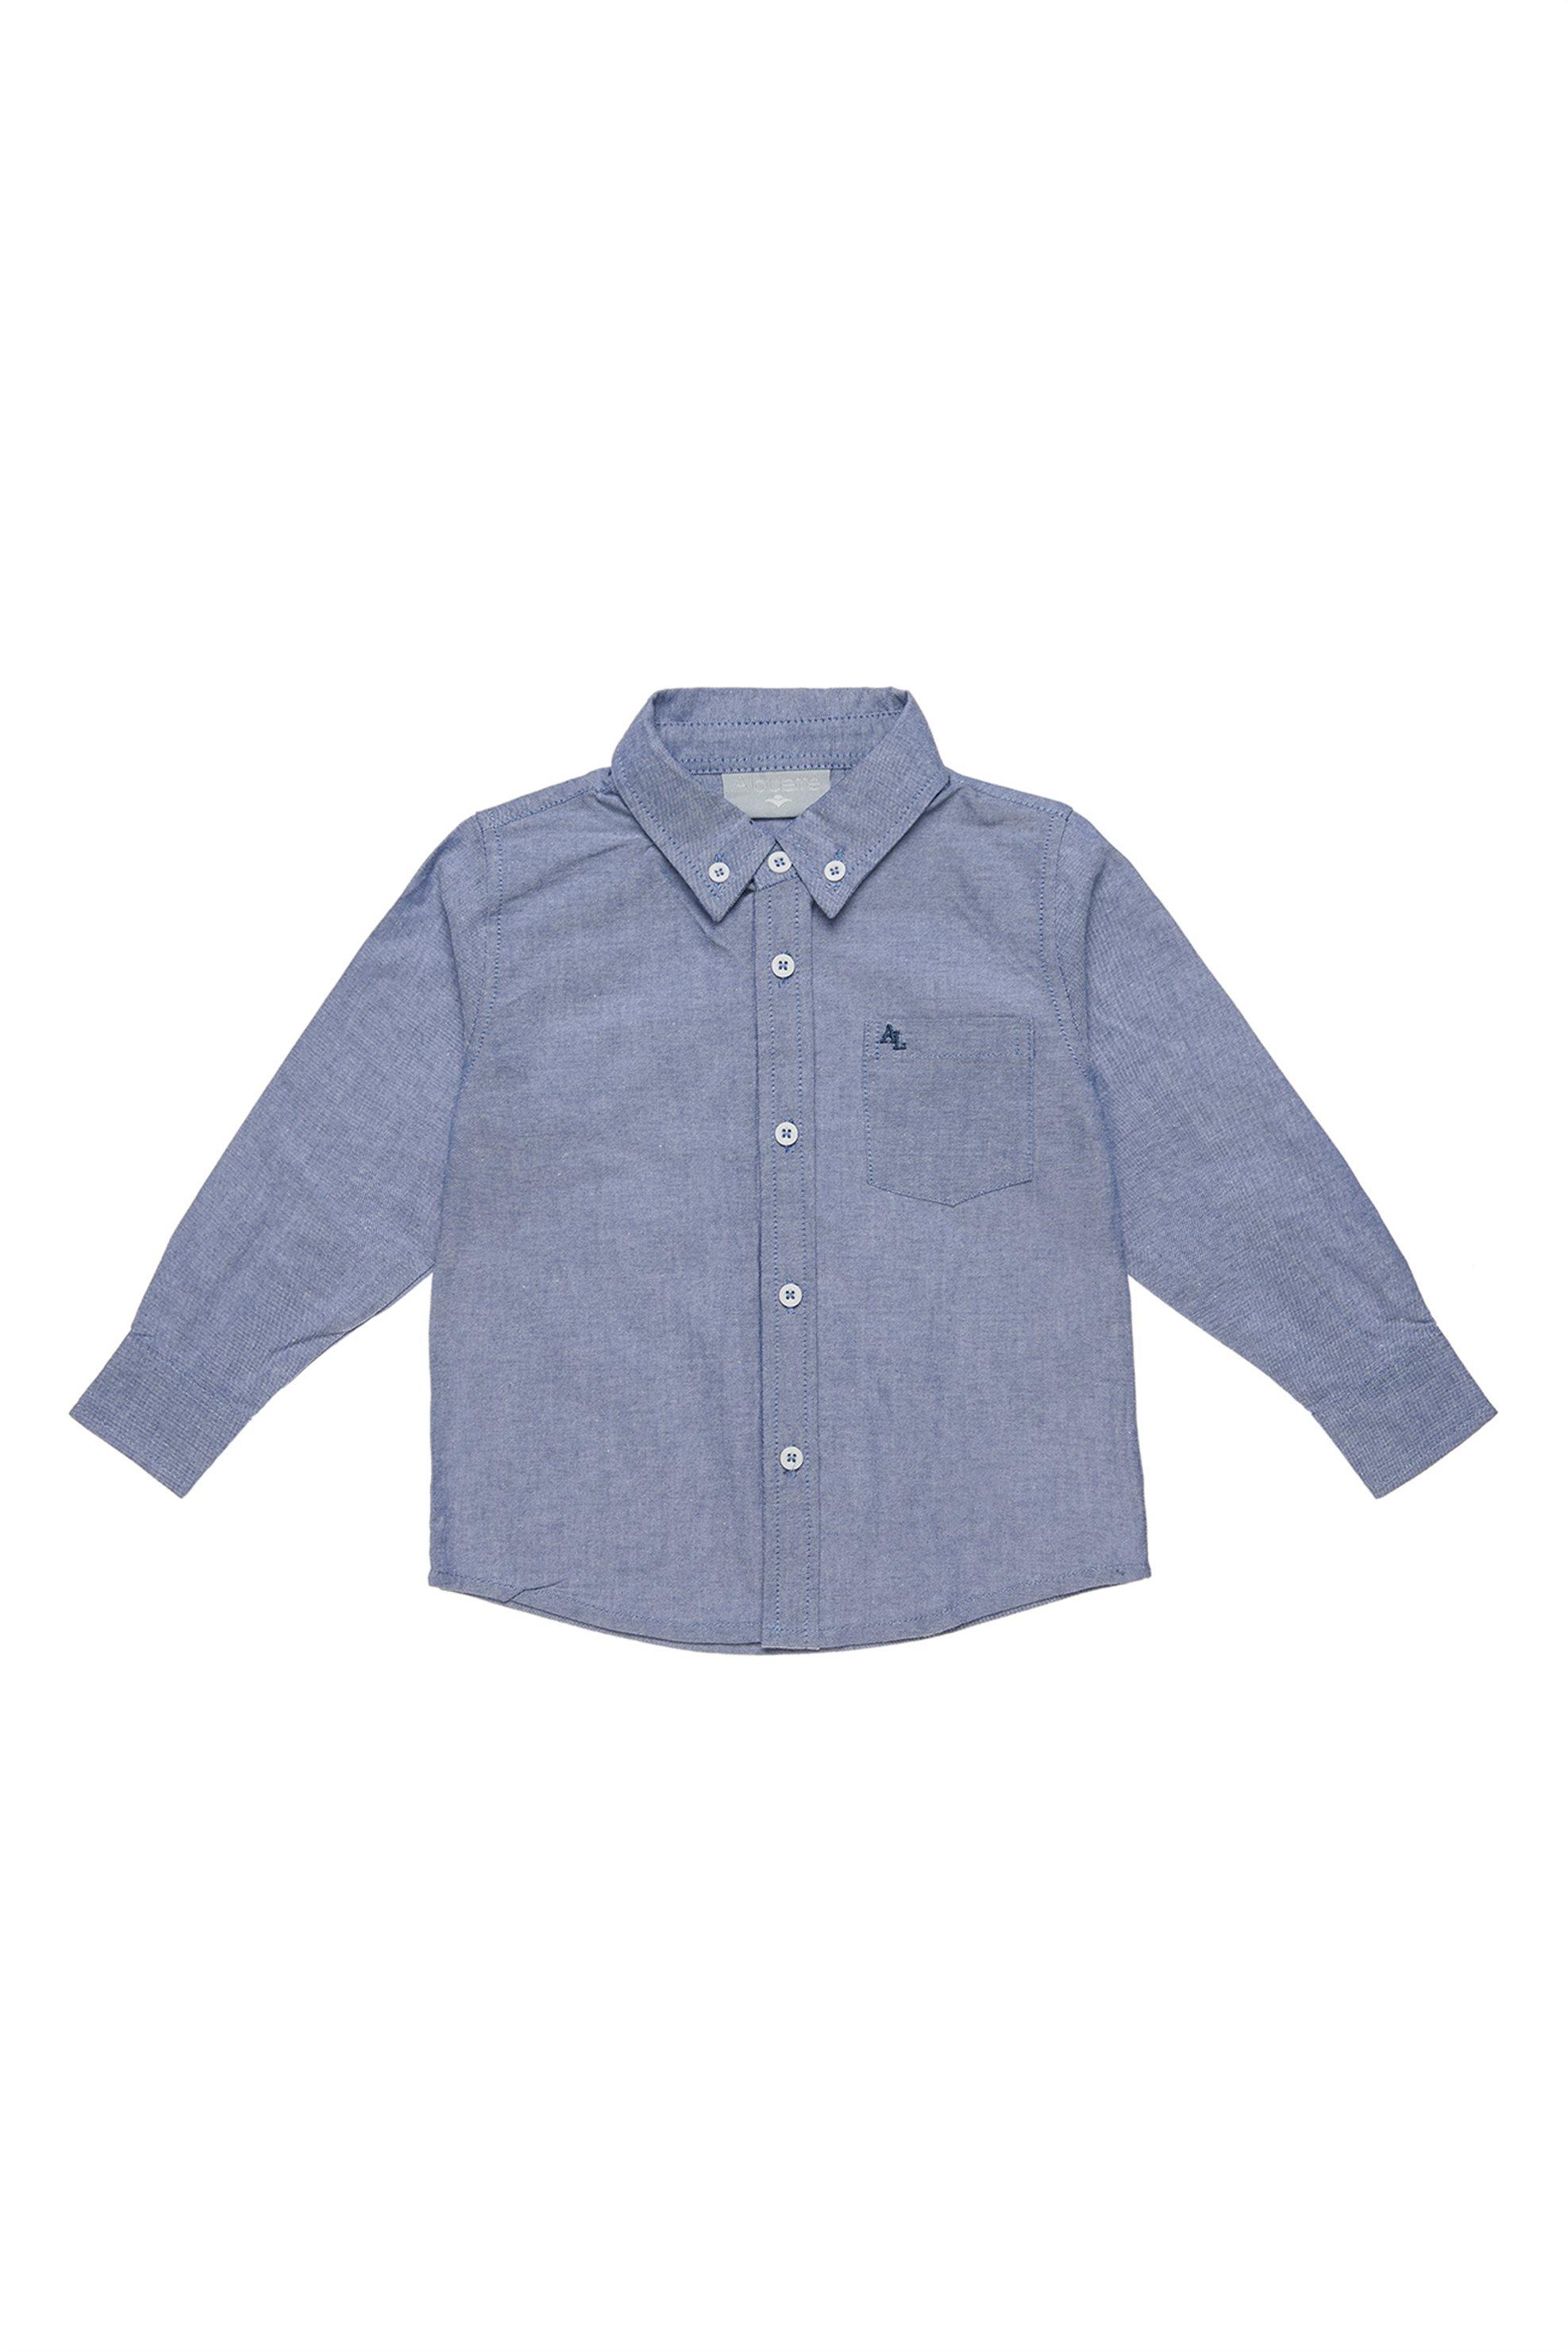 Notos Alouette παιδικό πουκάμισο με τσέπη - 00221296 - Μπλε a31a6446387